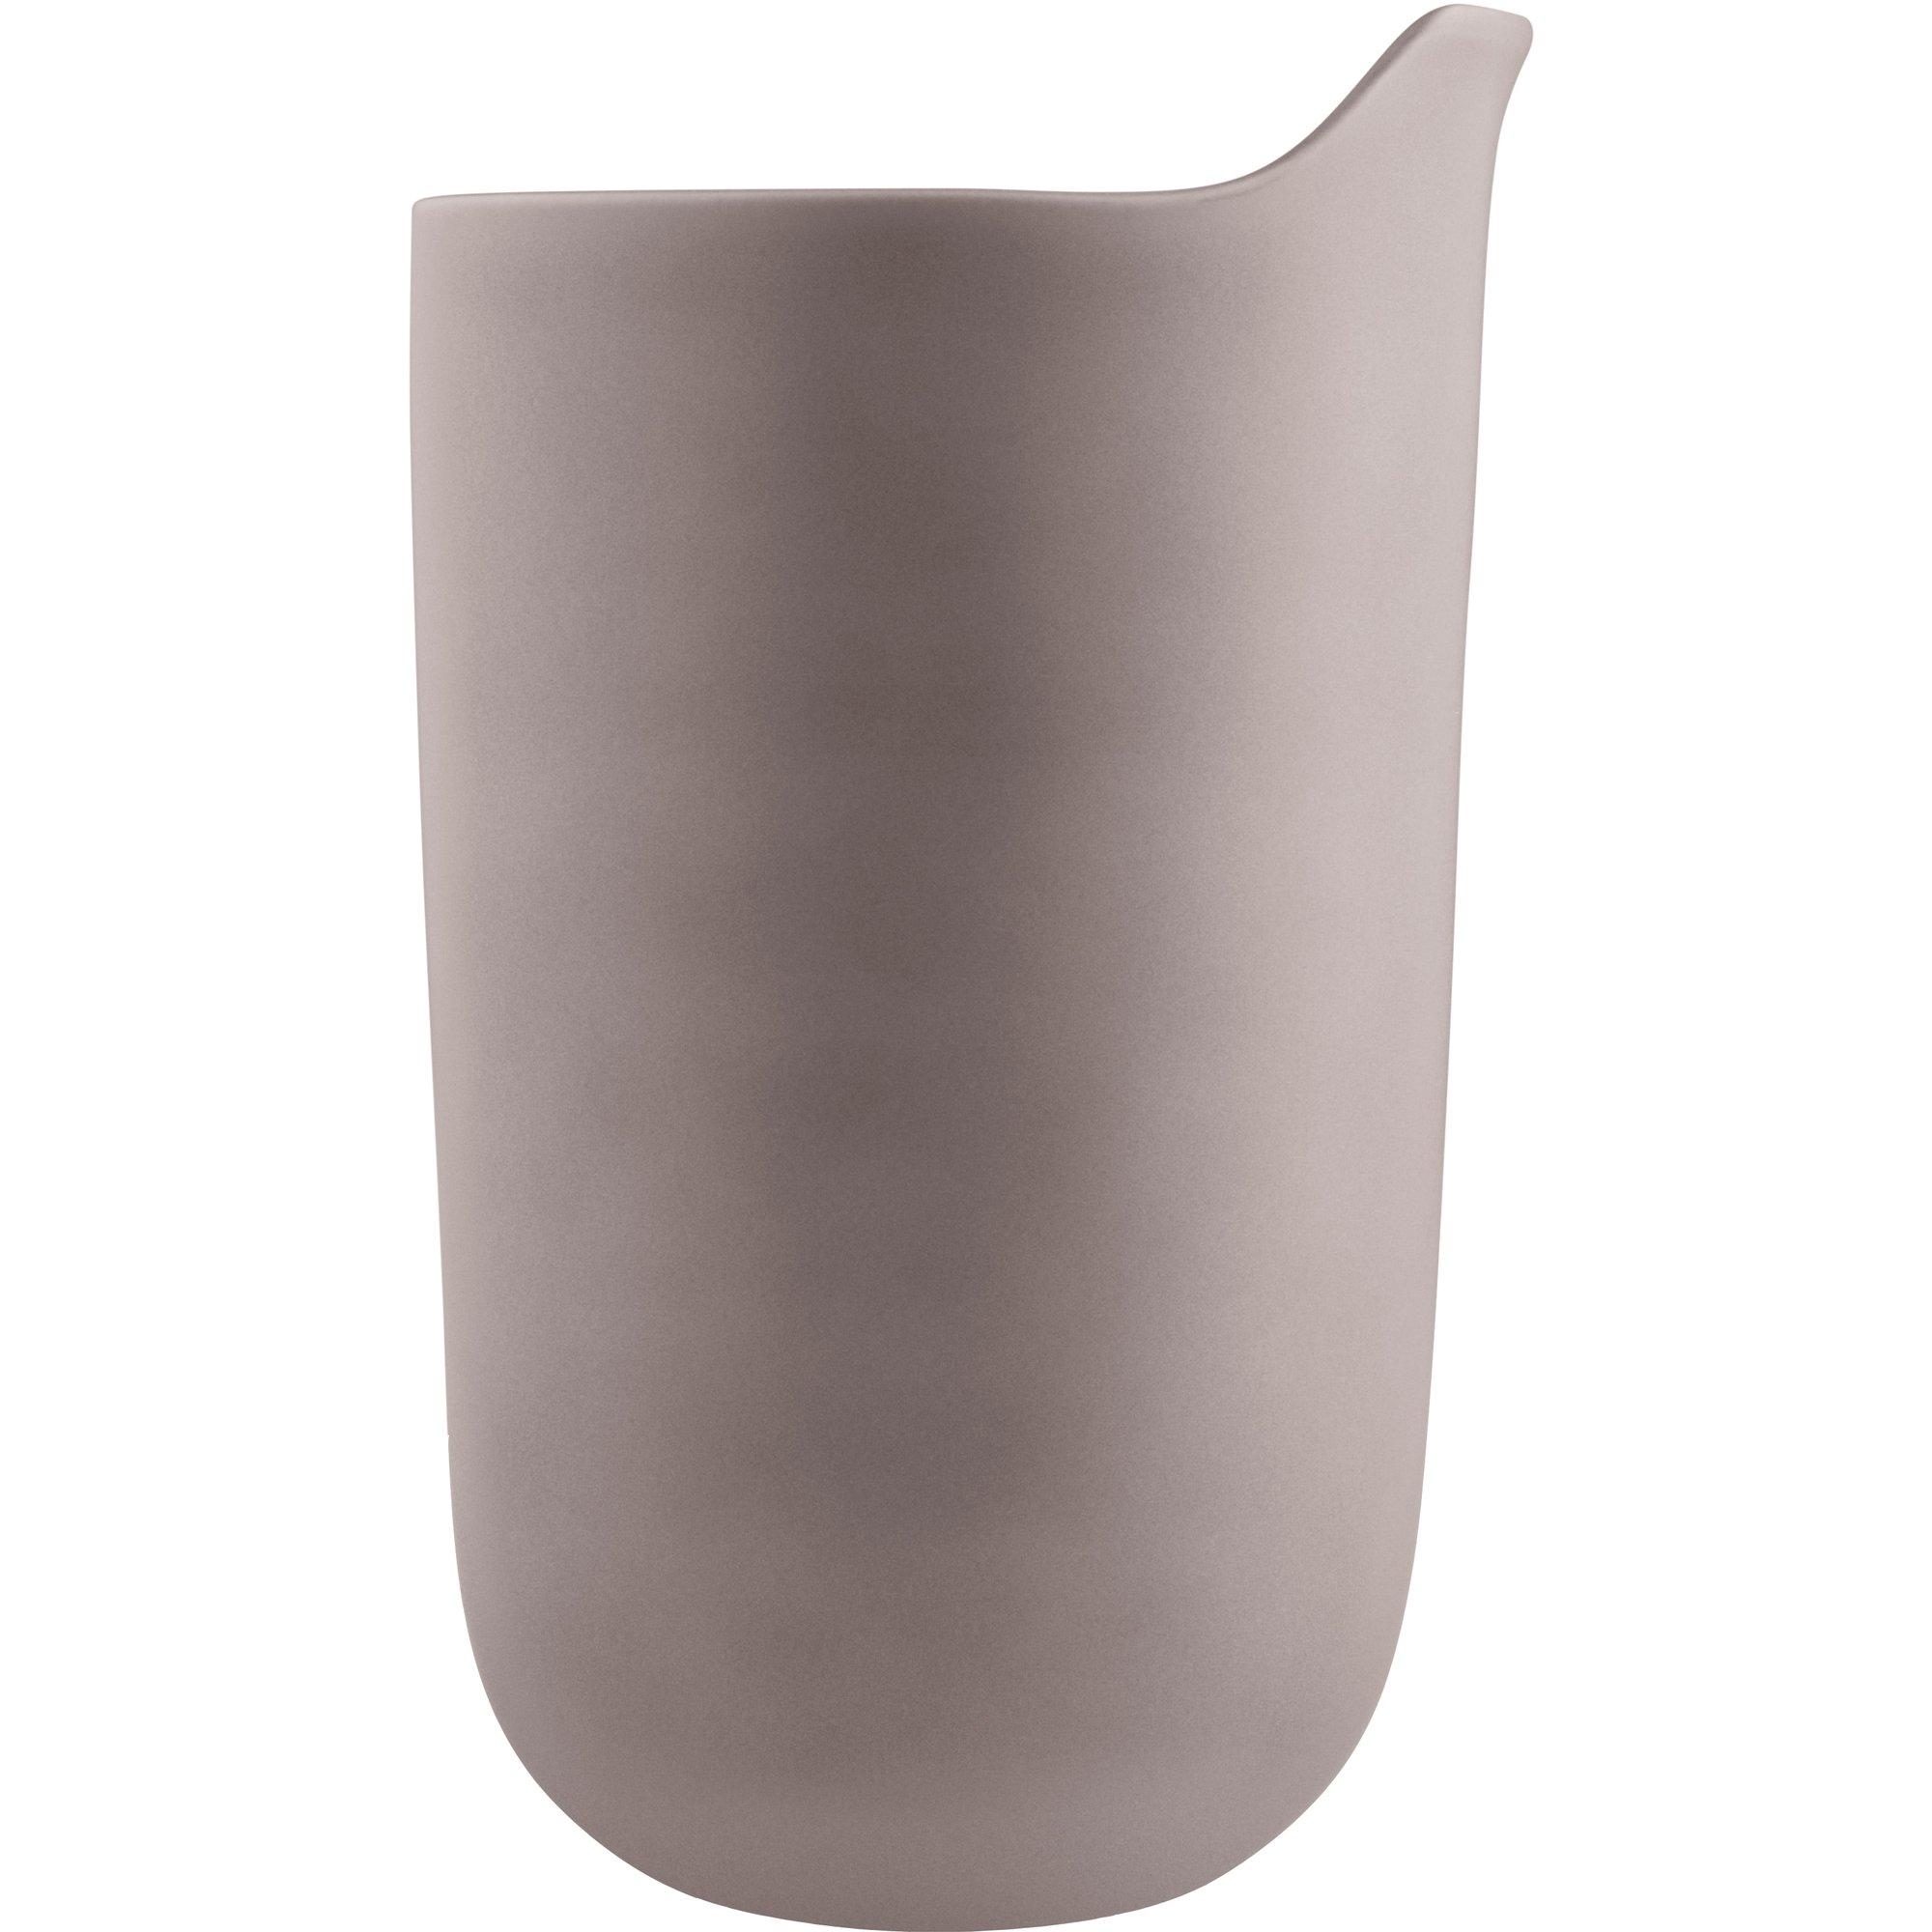 Eva Solo Termomugg i keramik 028 liter Grey